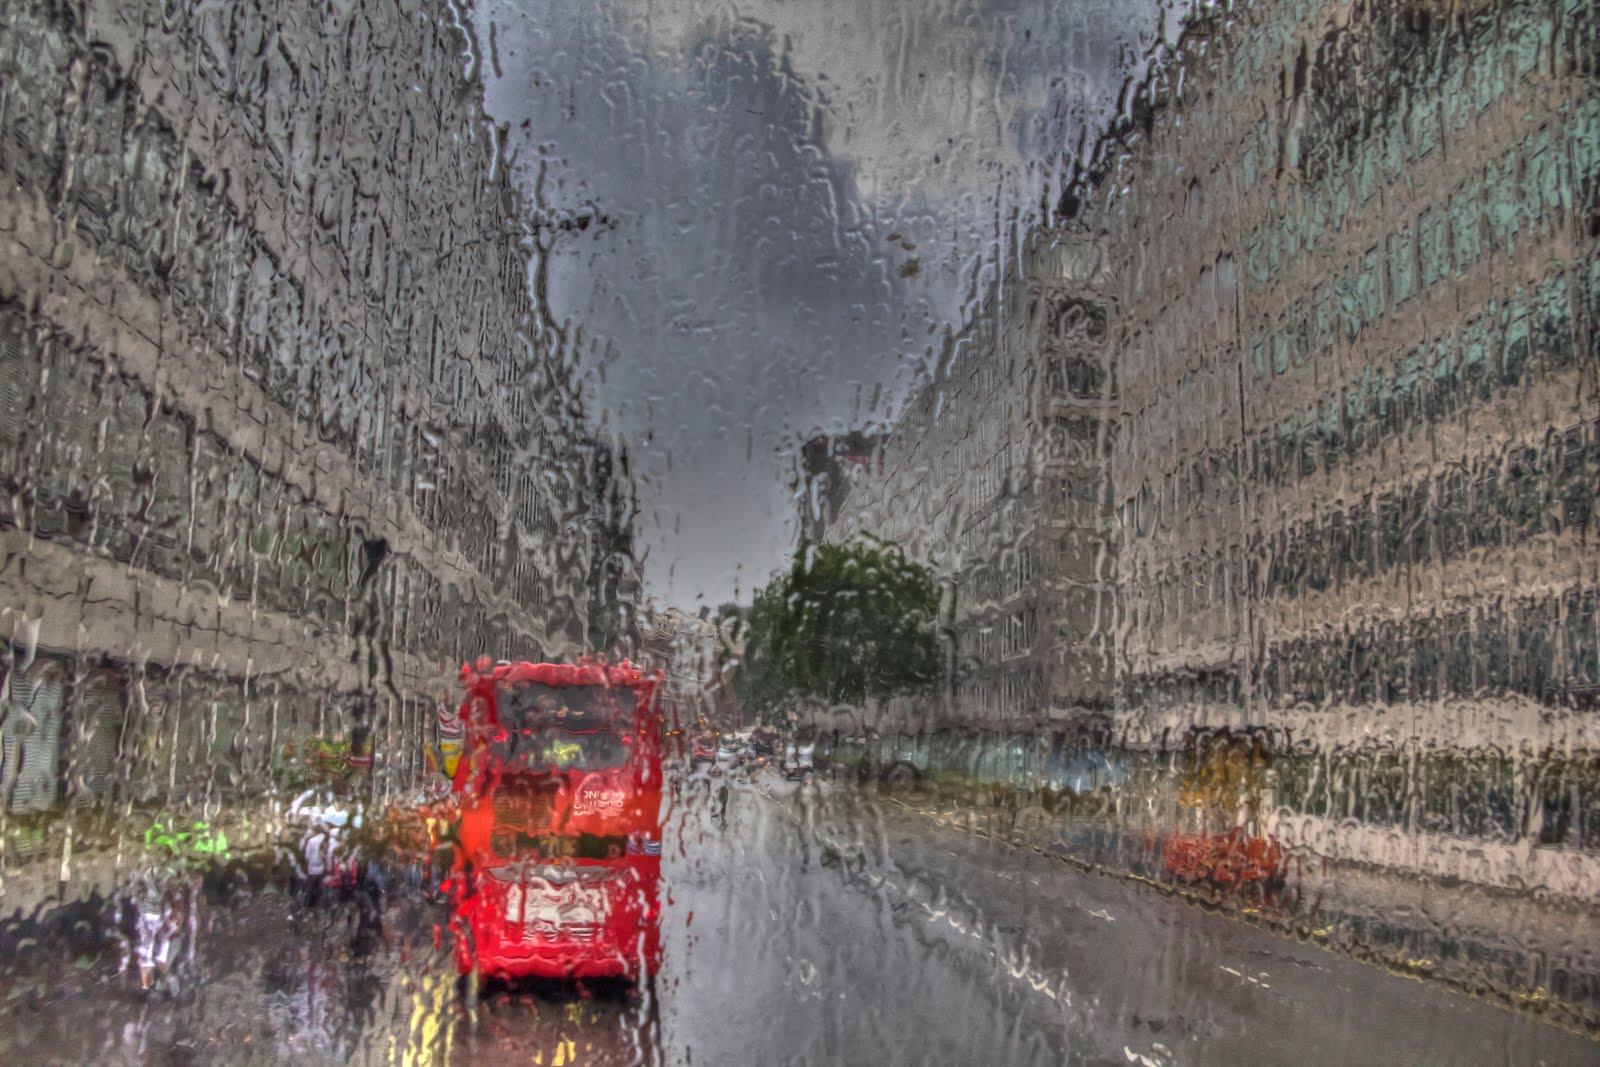 BADIA MASTERPIECES: LONDON PEOPLE AND THE RAIN